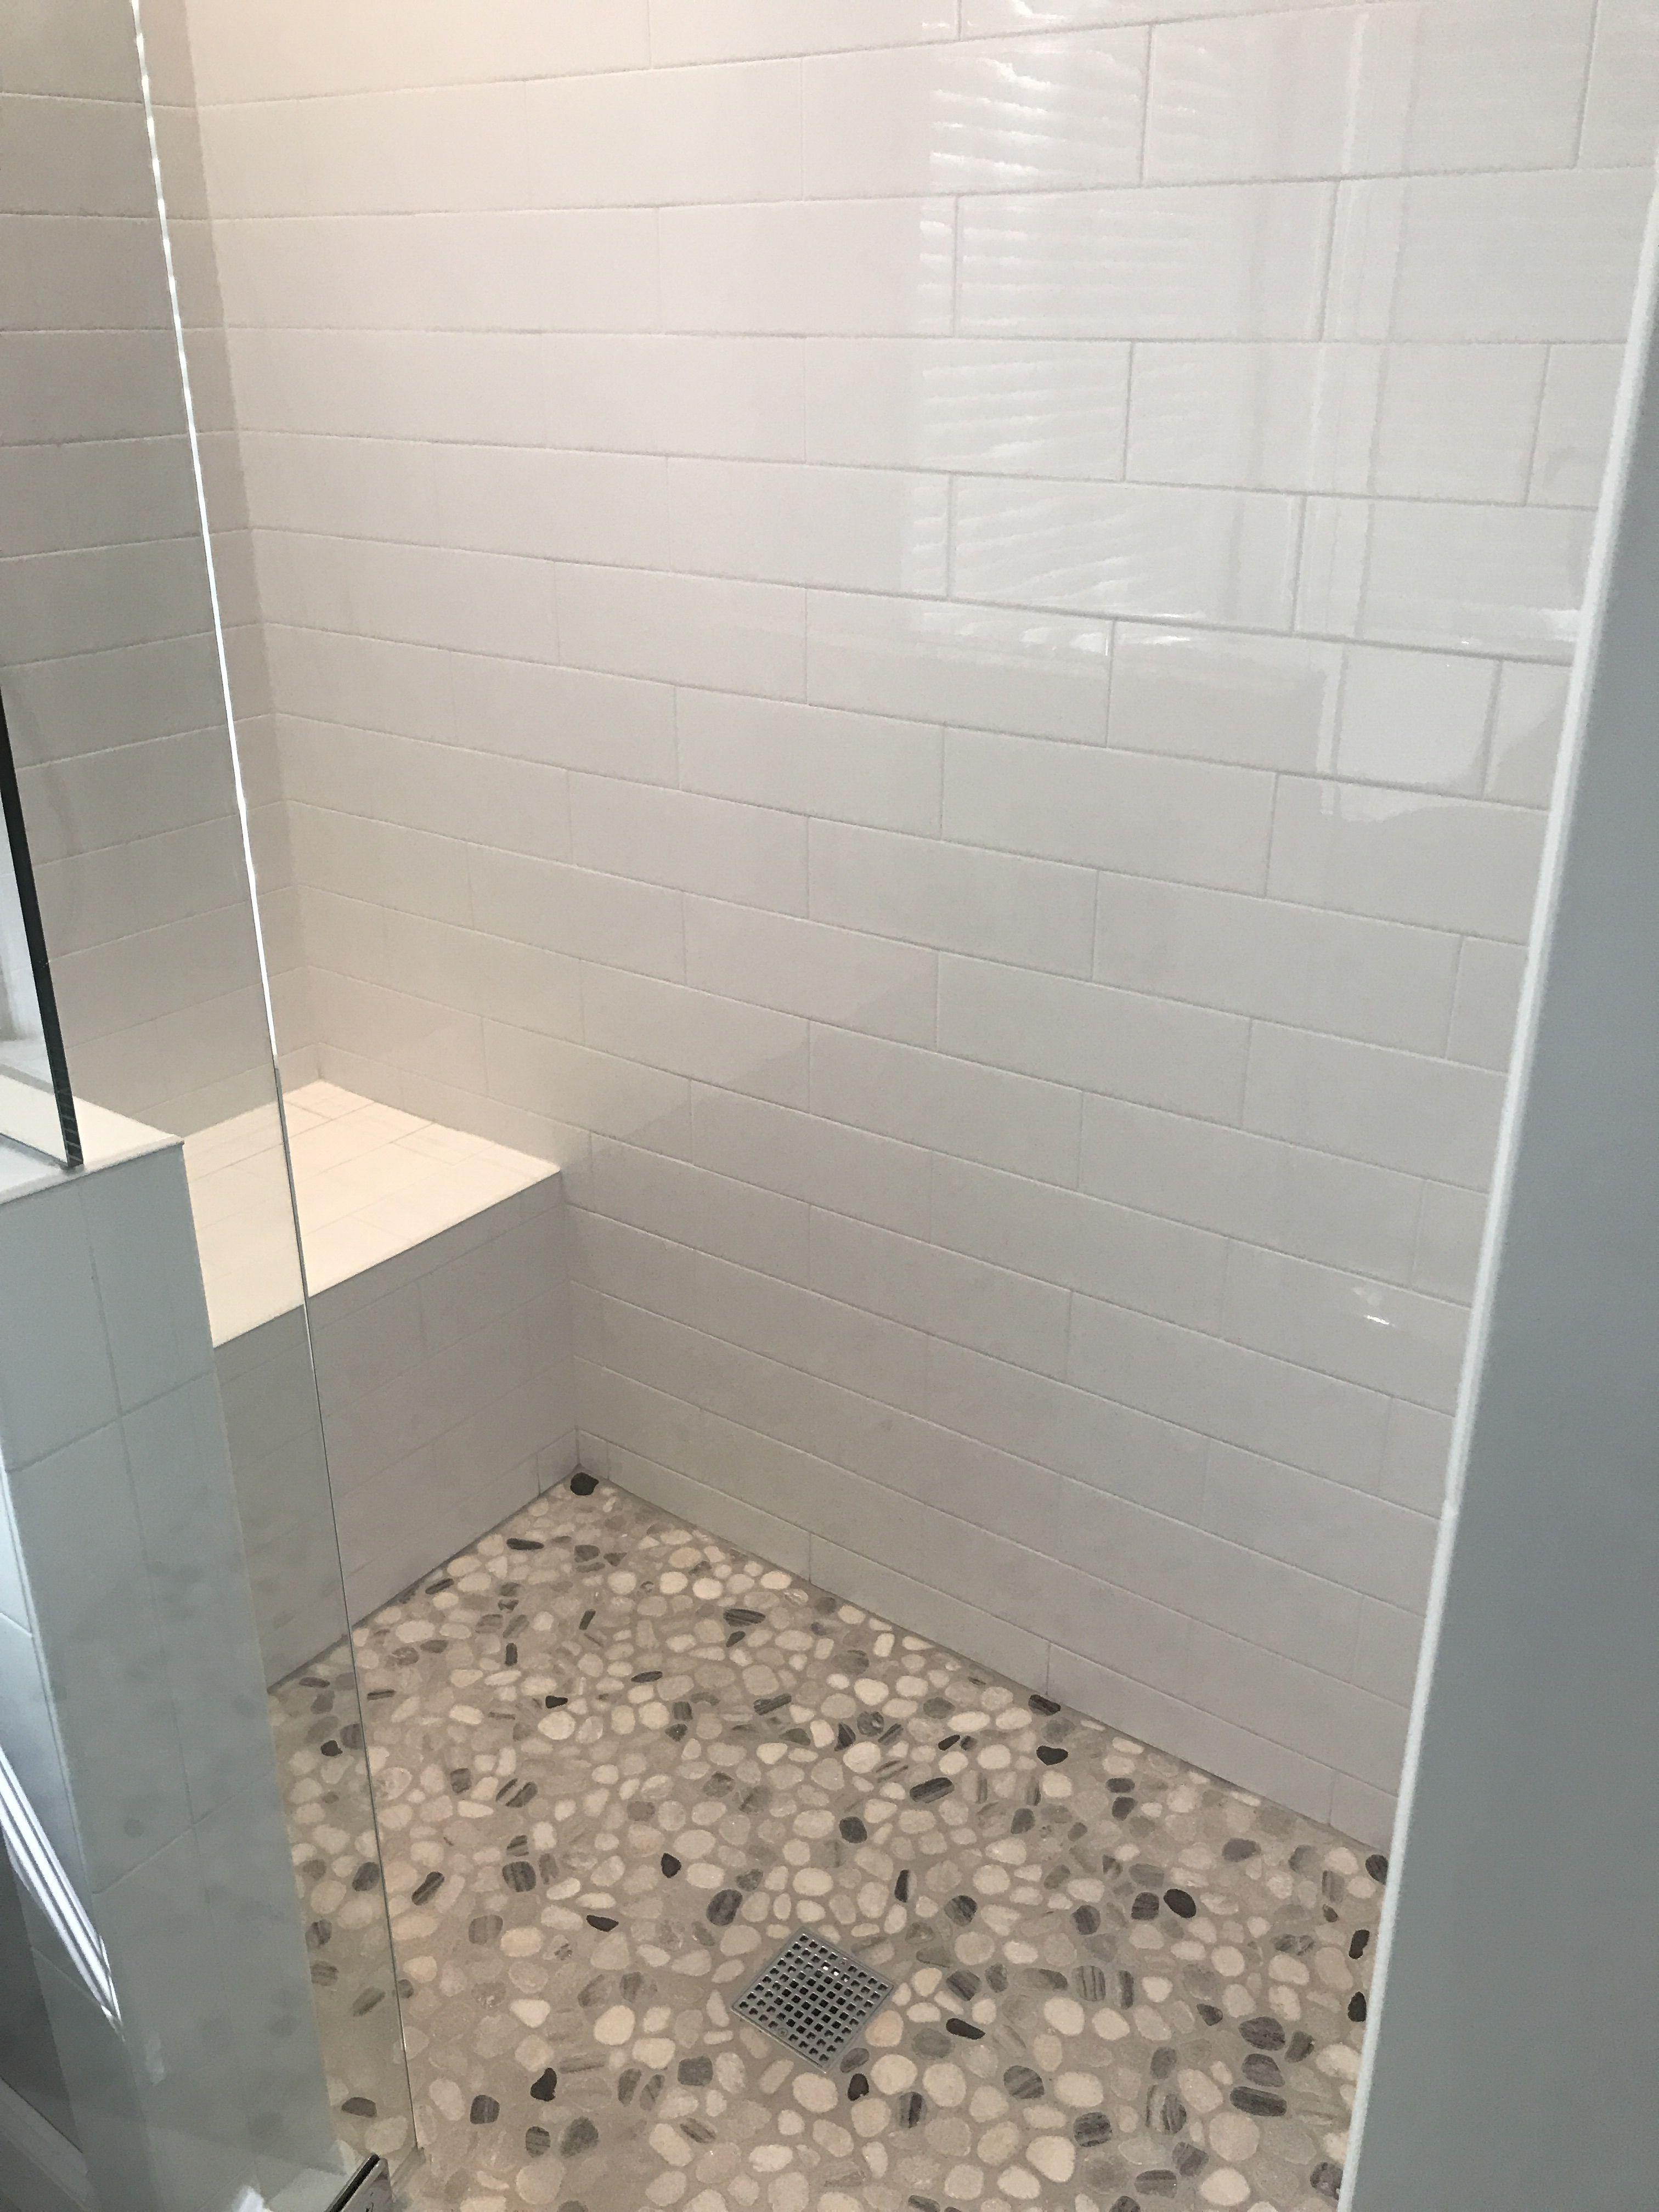 White Shower With Pebble Floor Google Search White Subway Tile Bathroom Pebble Shower Floor Stone Floor Bathroom